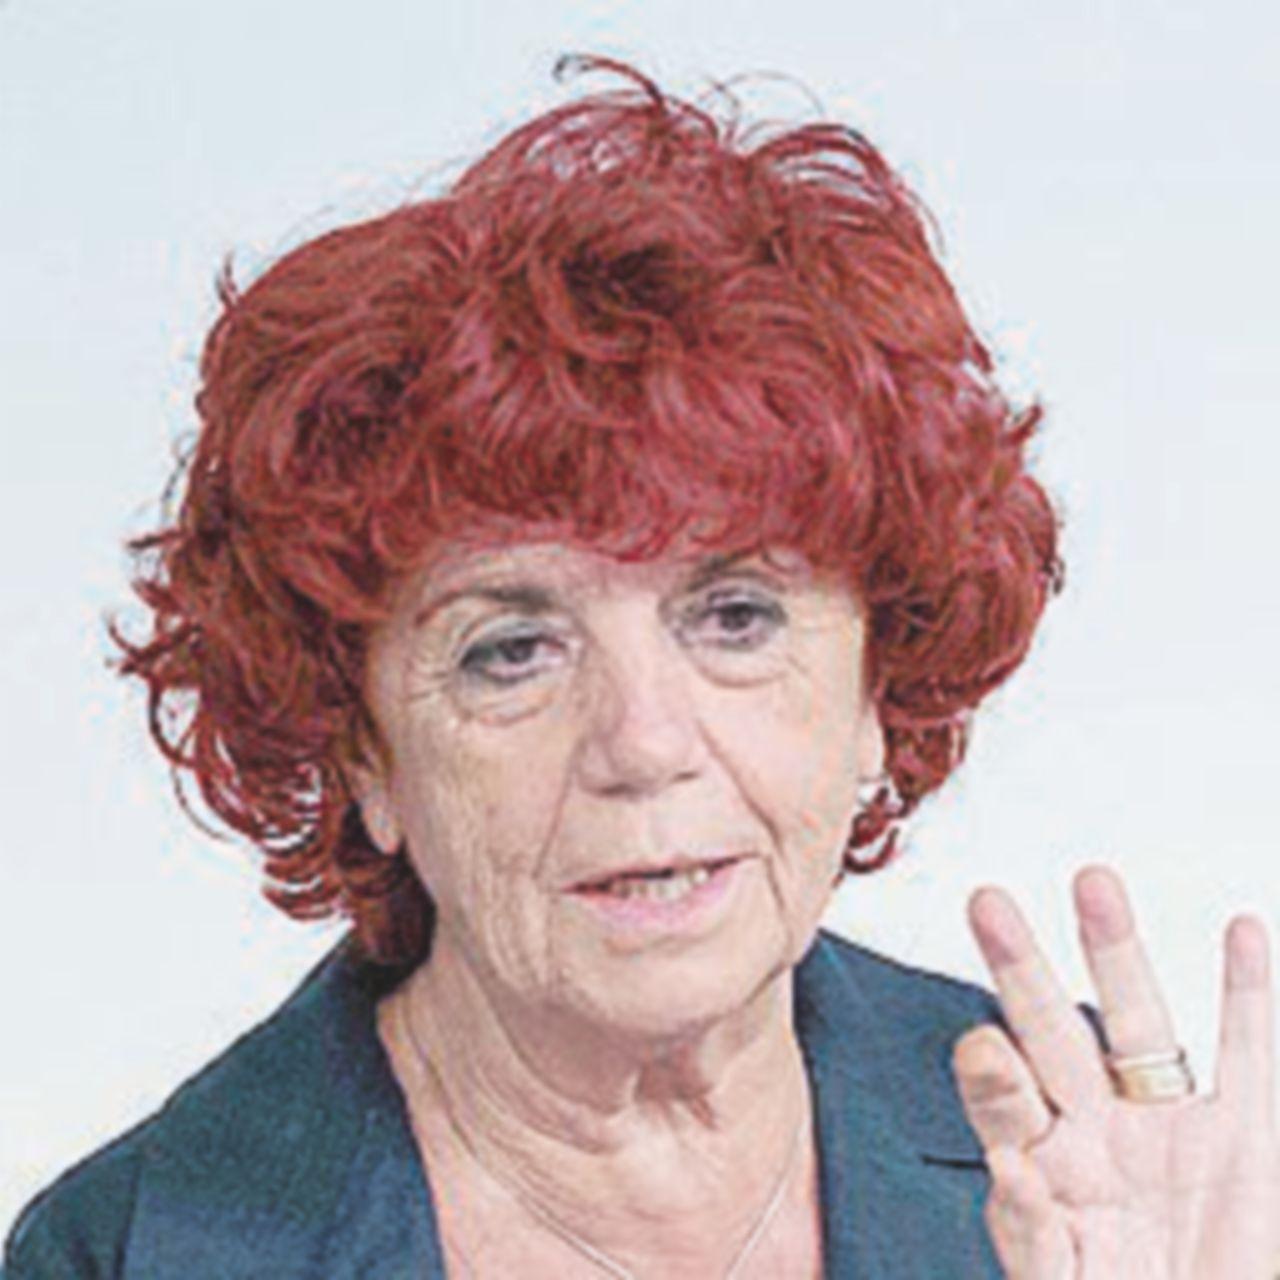 Fedeli riceve Laroma. Vedrà anche Tor Vergata?